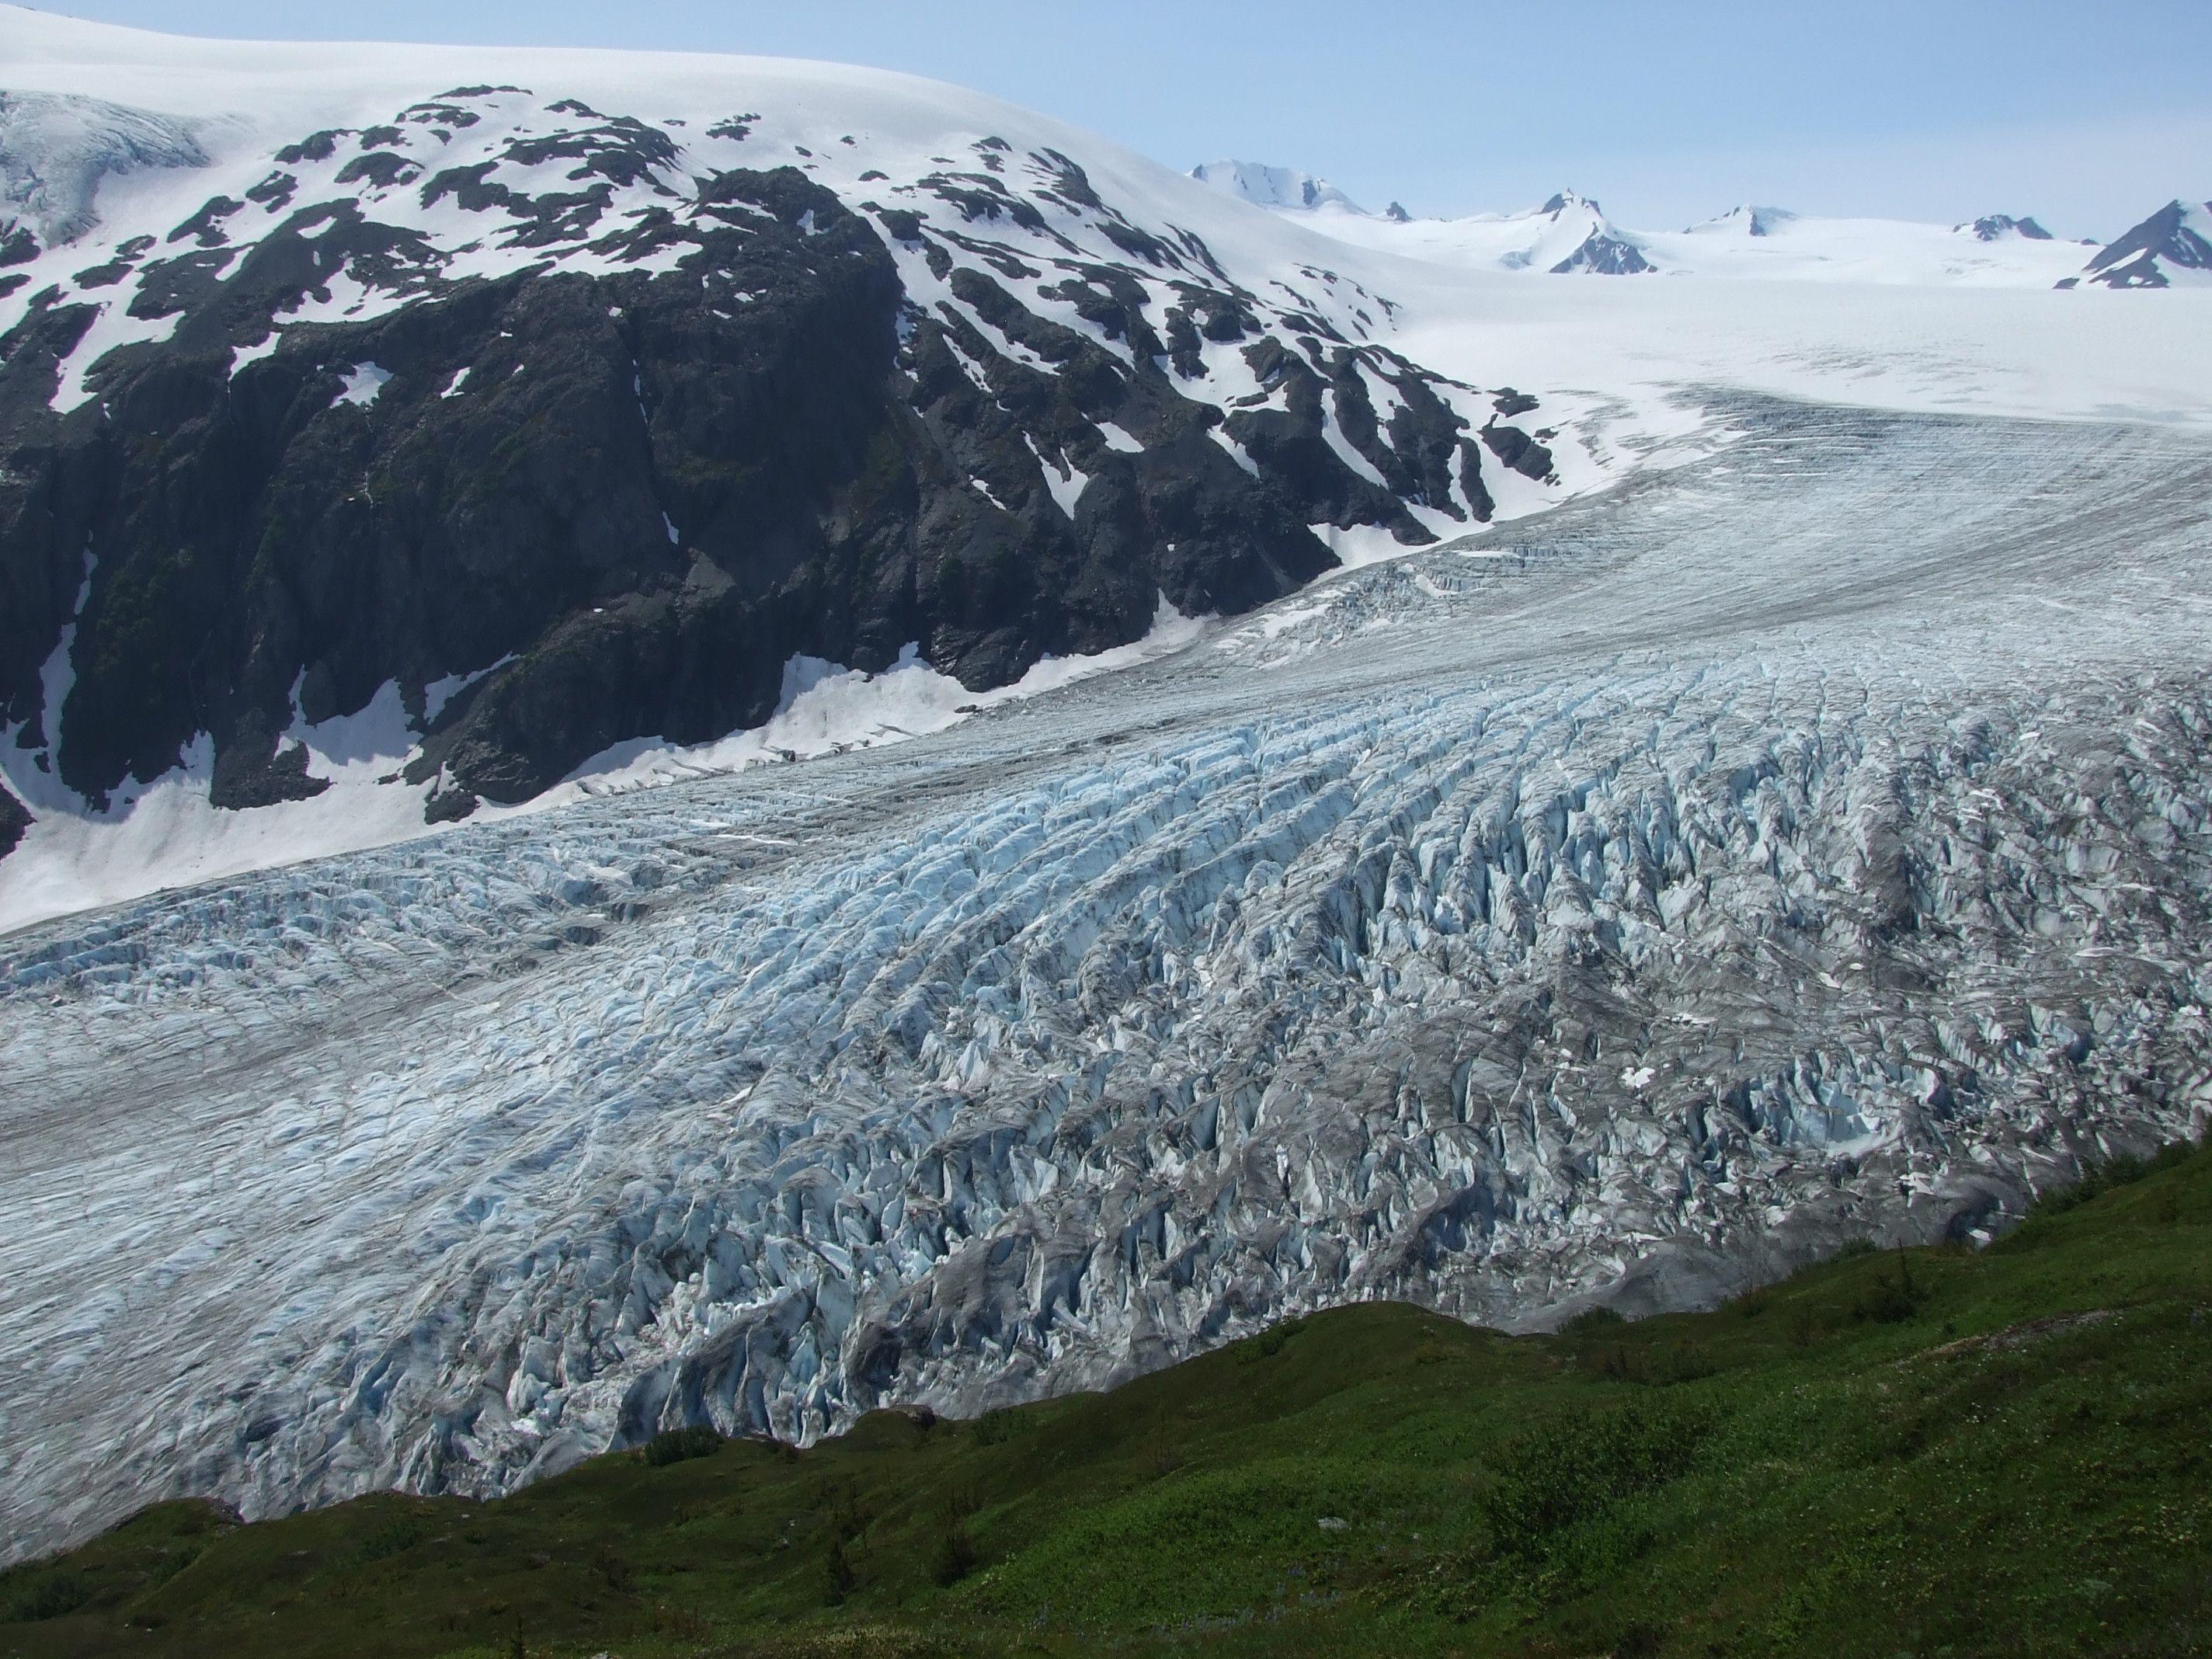 Harding ice field kenai fjords national park alaska